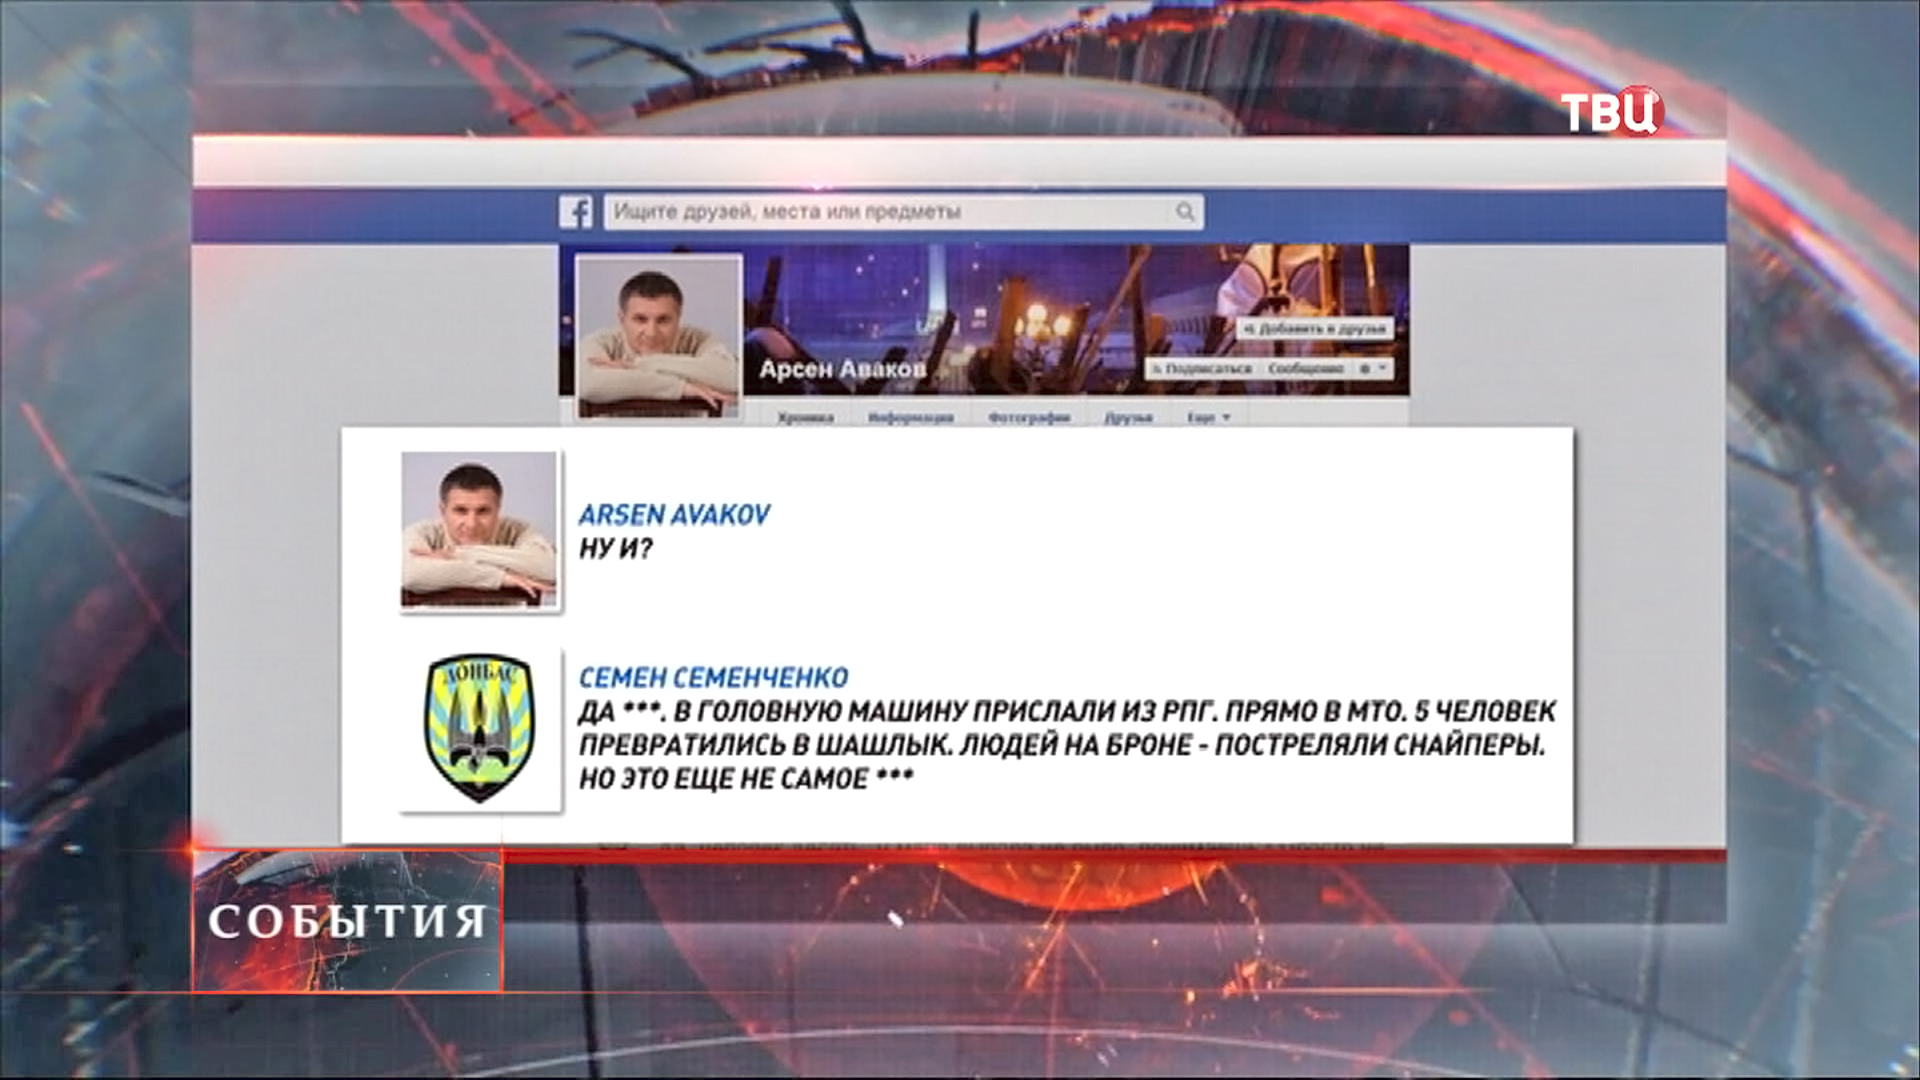 Переписка Арсена Авакова и Семена Семенченко